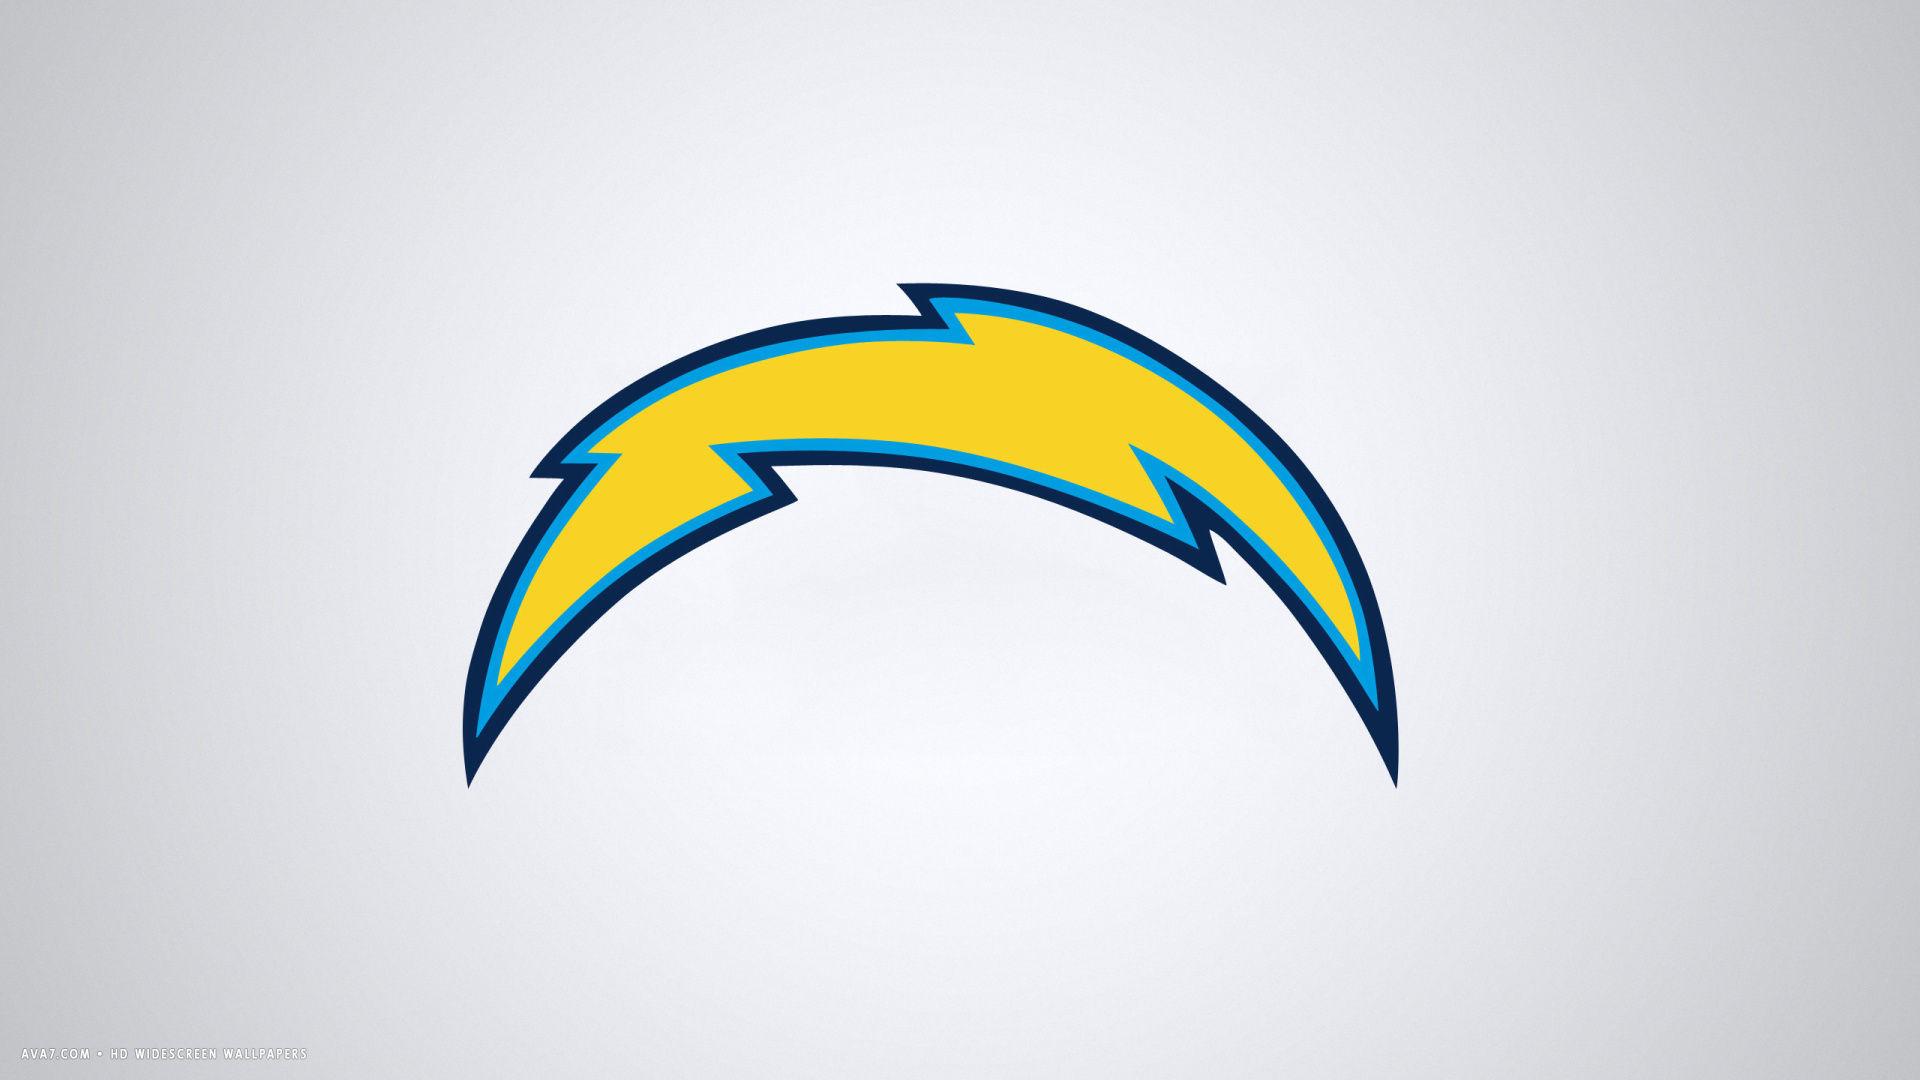 San Diego Chargers Nfl Football Team Hd Widescreen Wallpaper